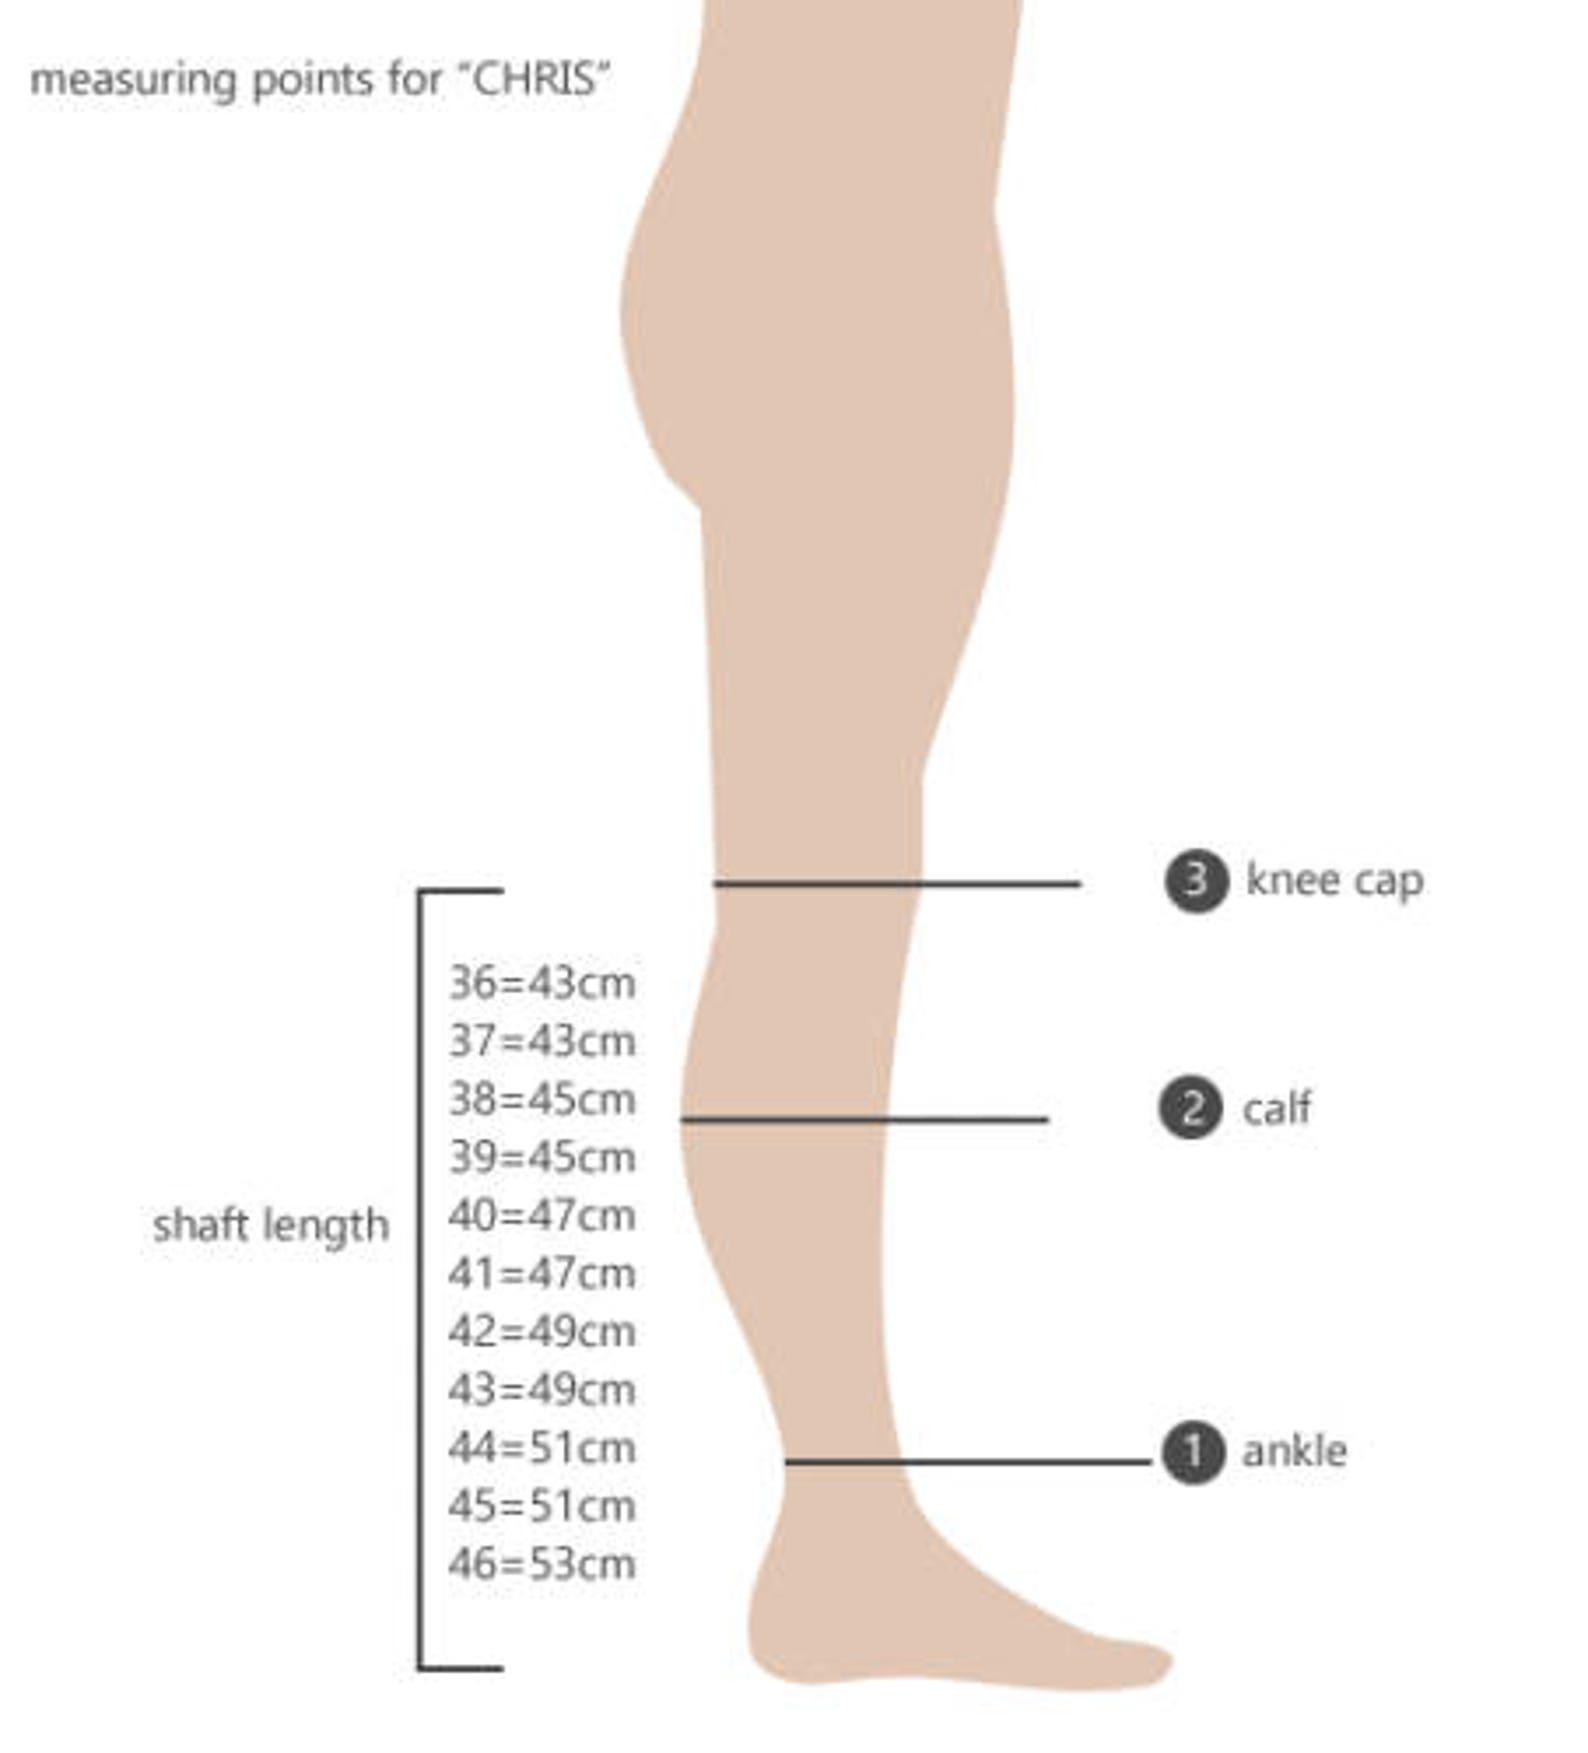 rtbu soap (zip) custom circumference fetish ballet wedge pointe knee boots hoof